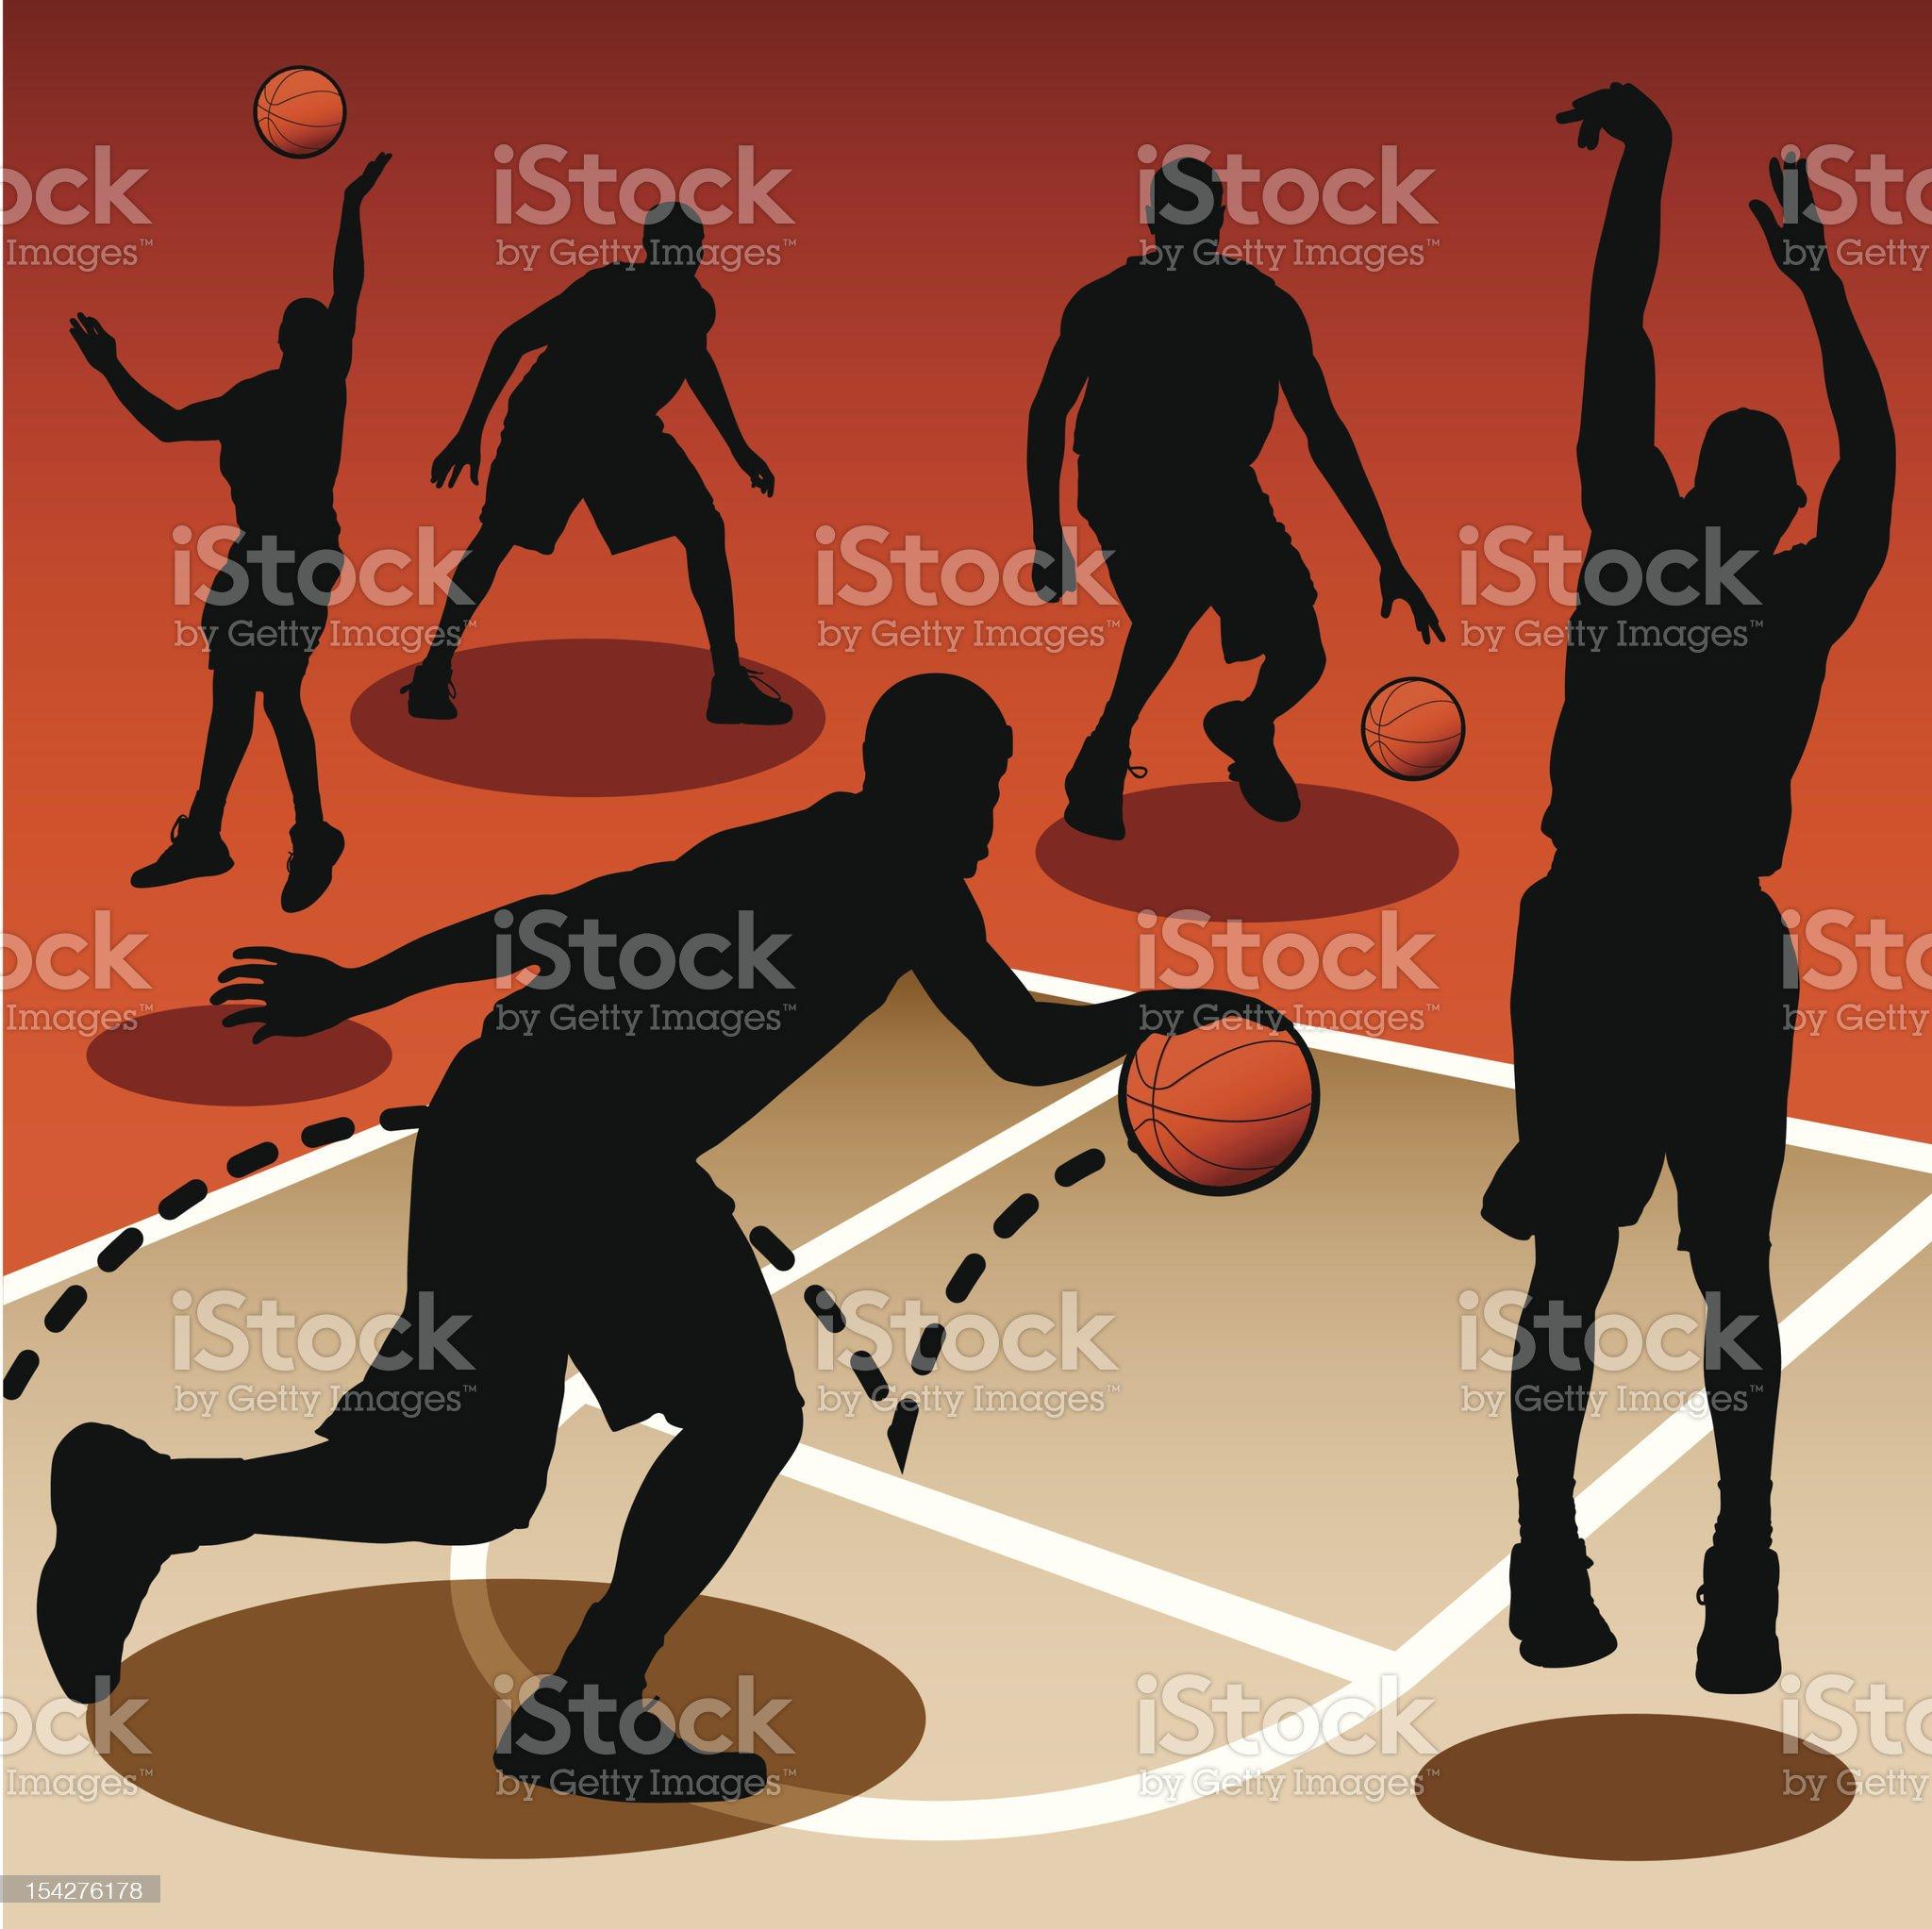 Basketball Players royalty-free stock vector art